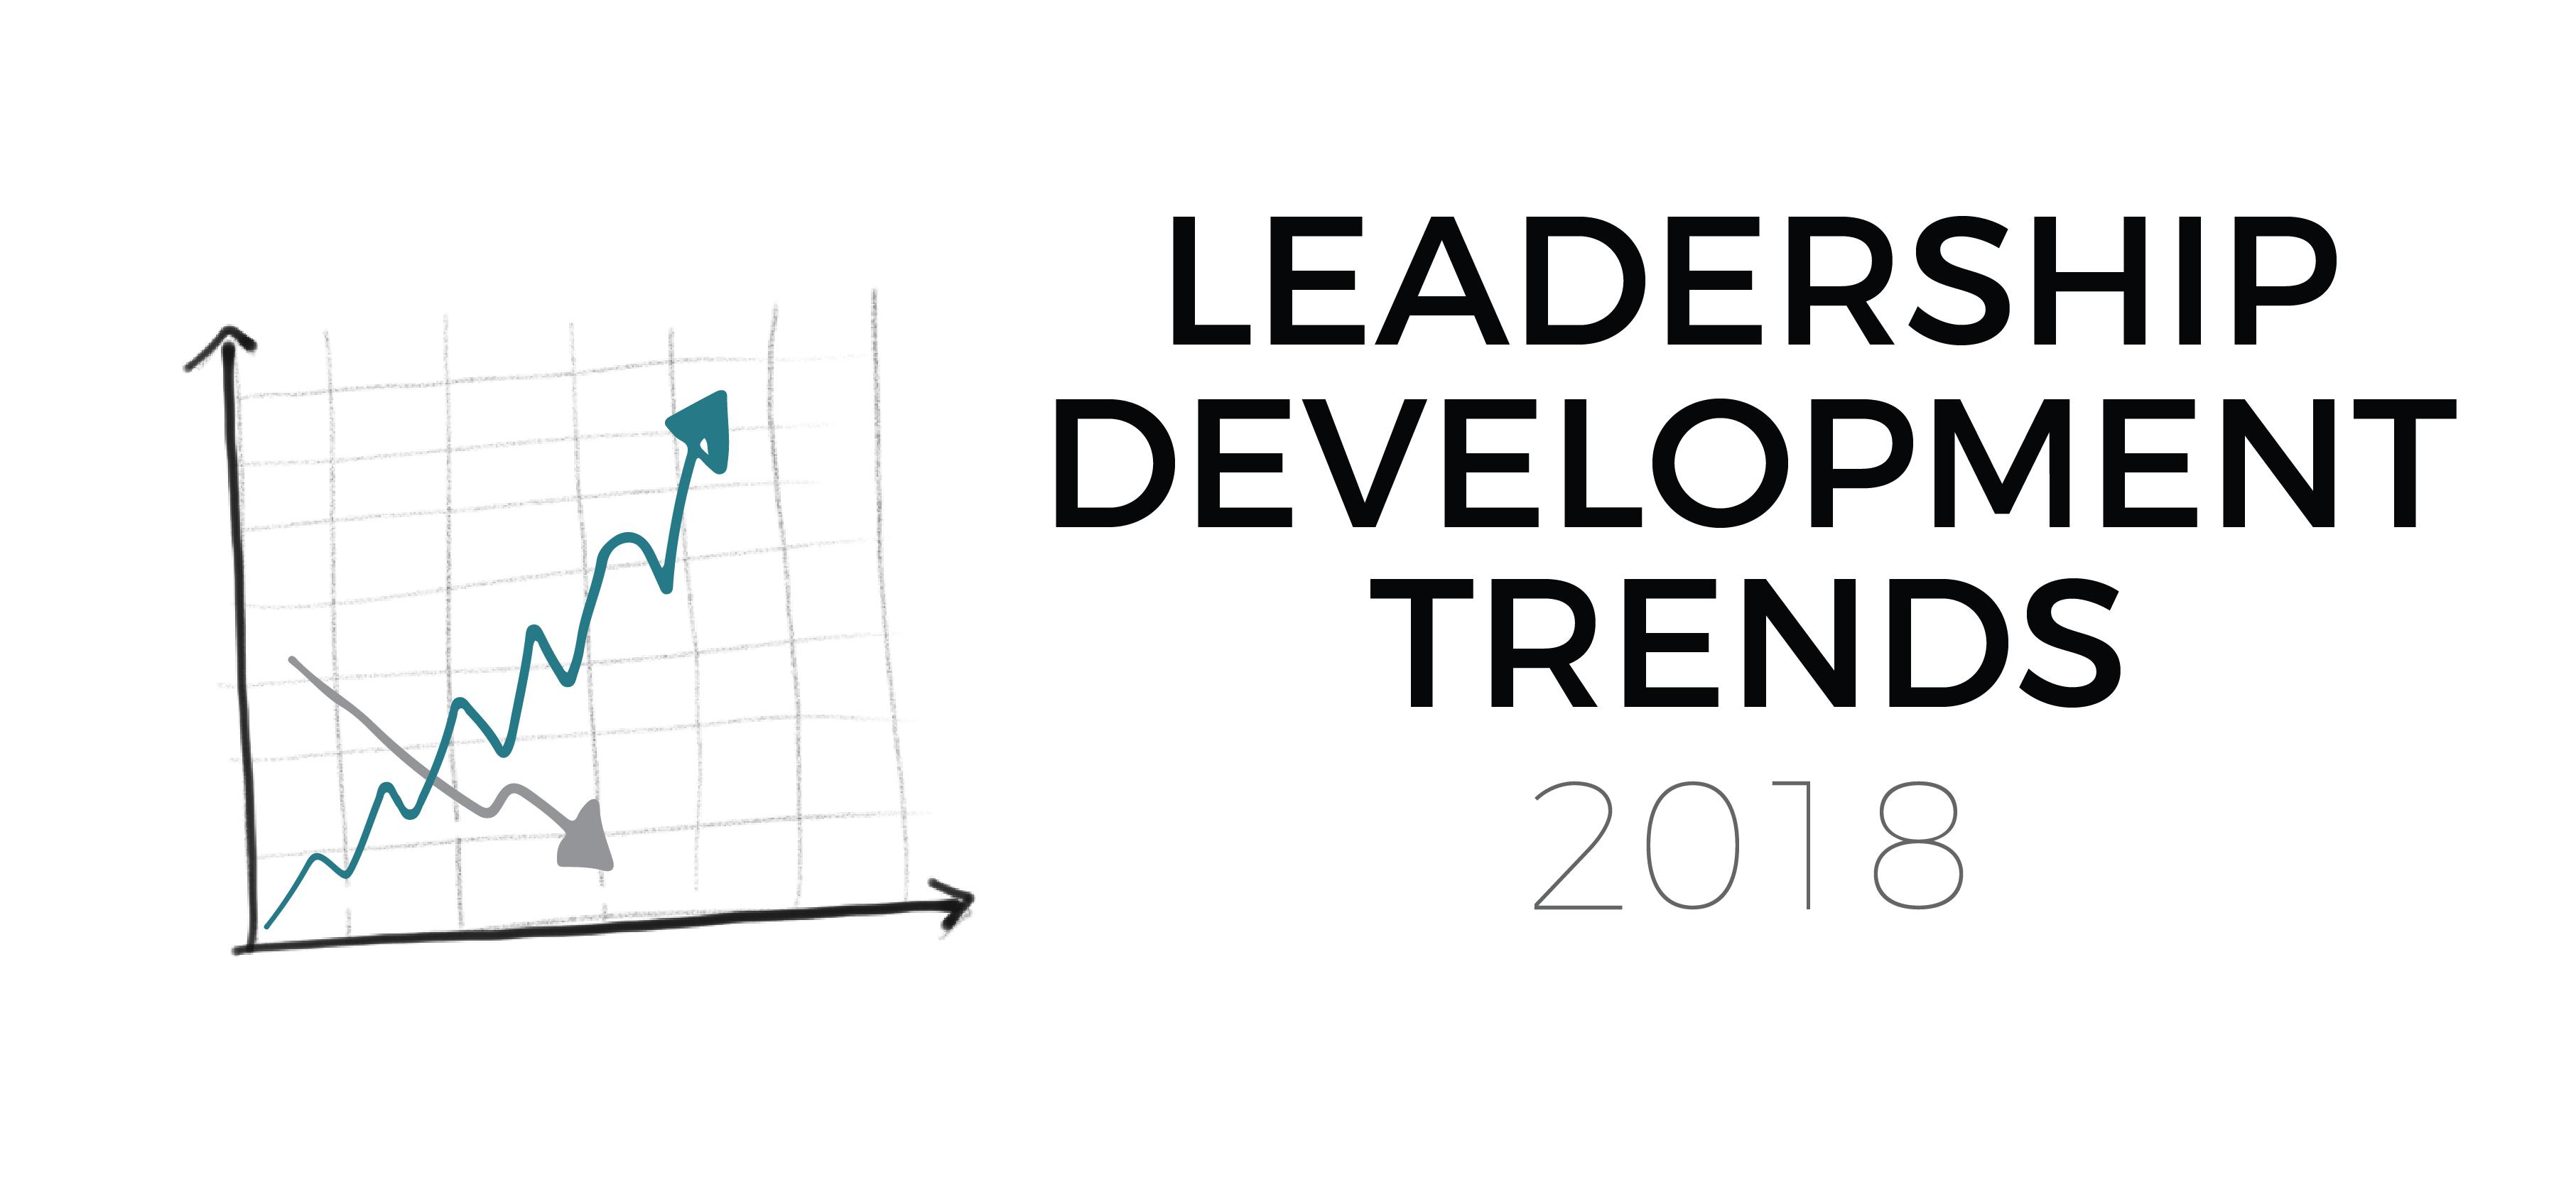 Leadership Development Trends